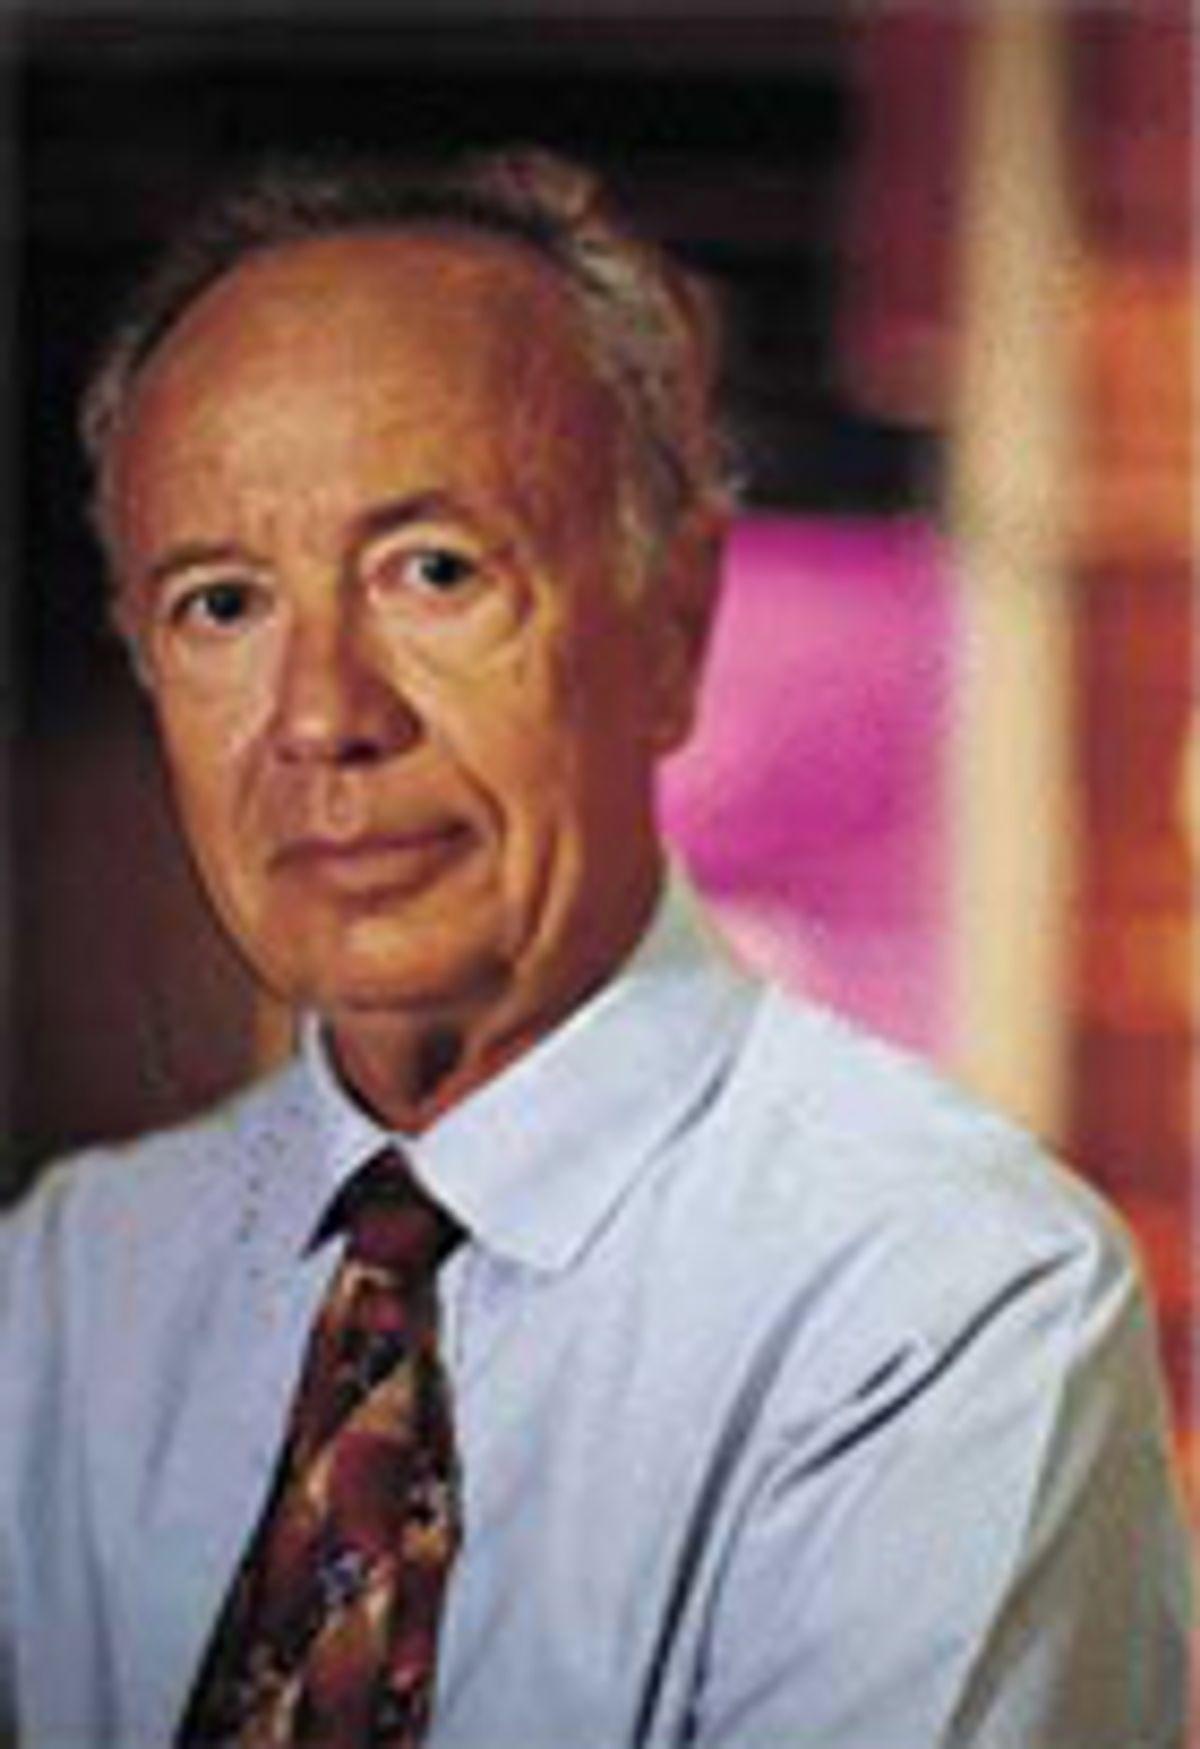 Profile: Andy Grove